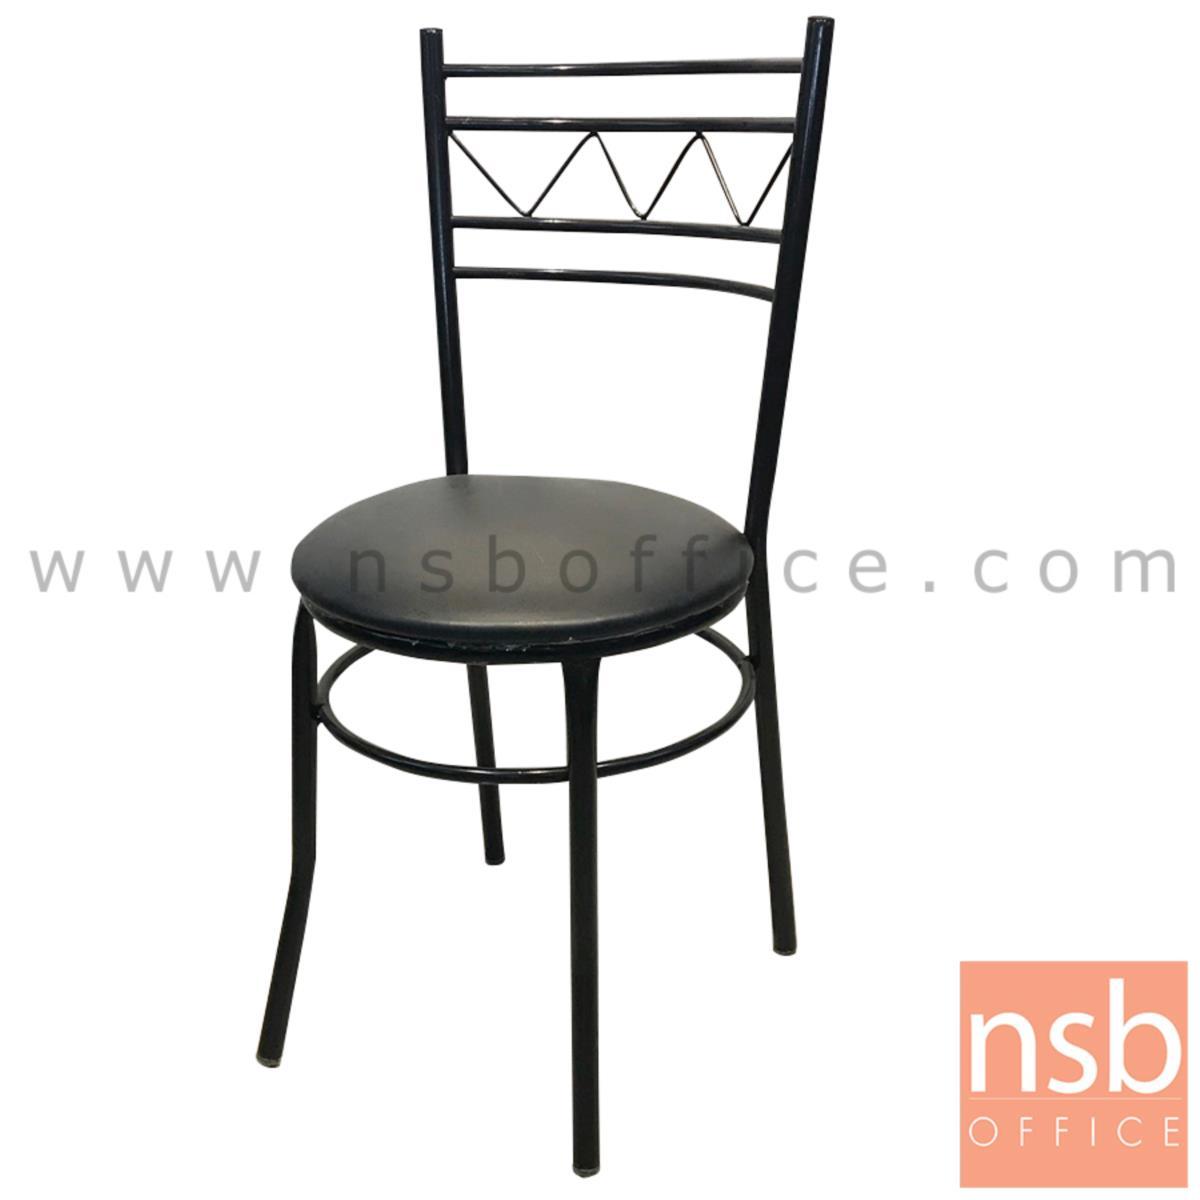 B20A105:เก้าอี้อเนกประสงค์ รุ่น IXORA (ไอโซร่า)  ขาเหล็กพ่นดำ